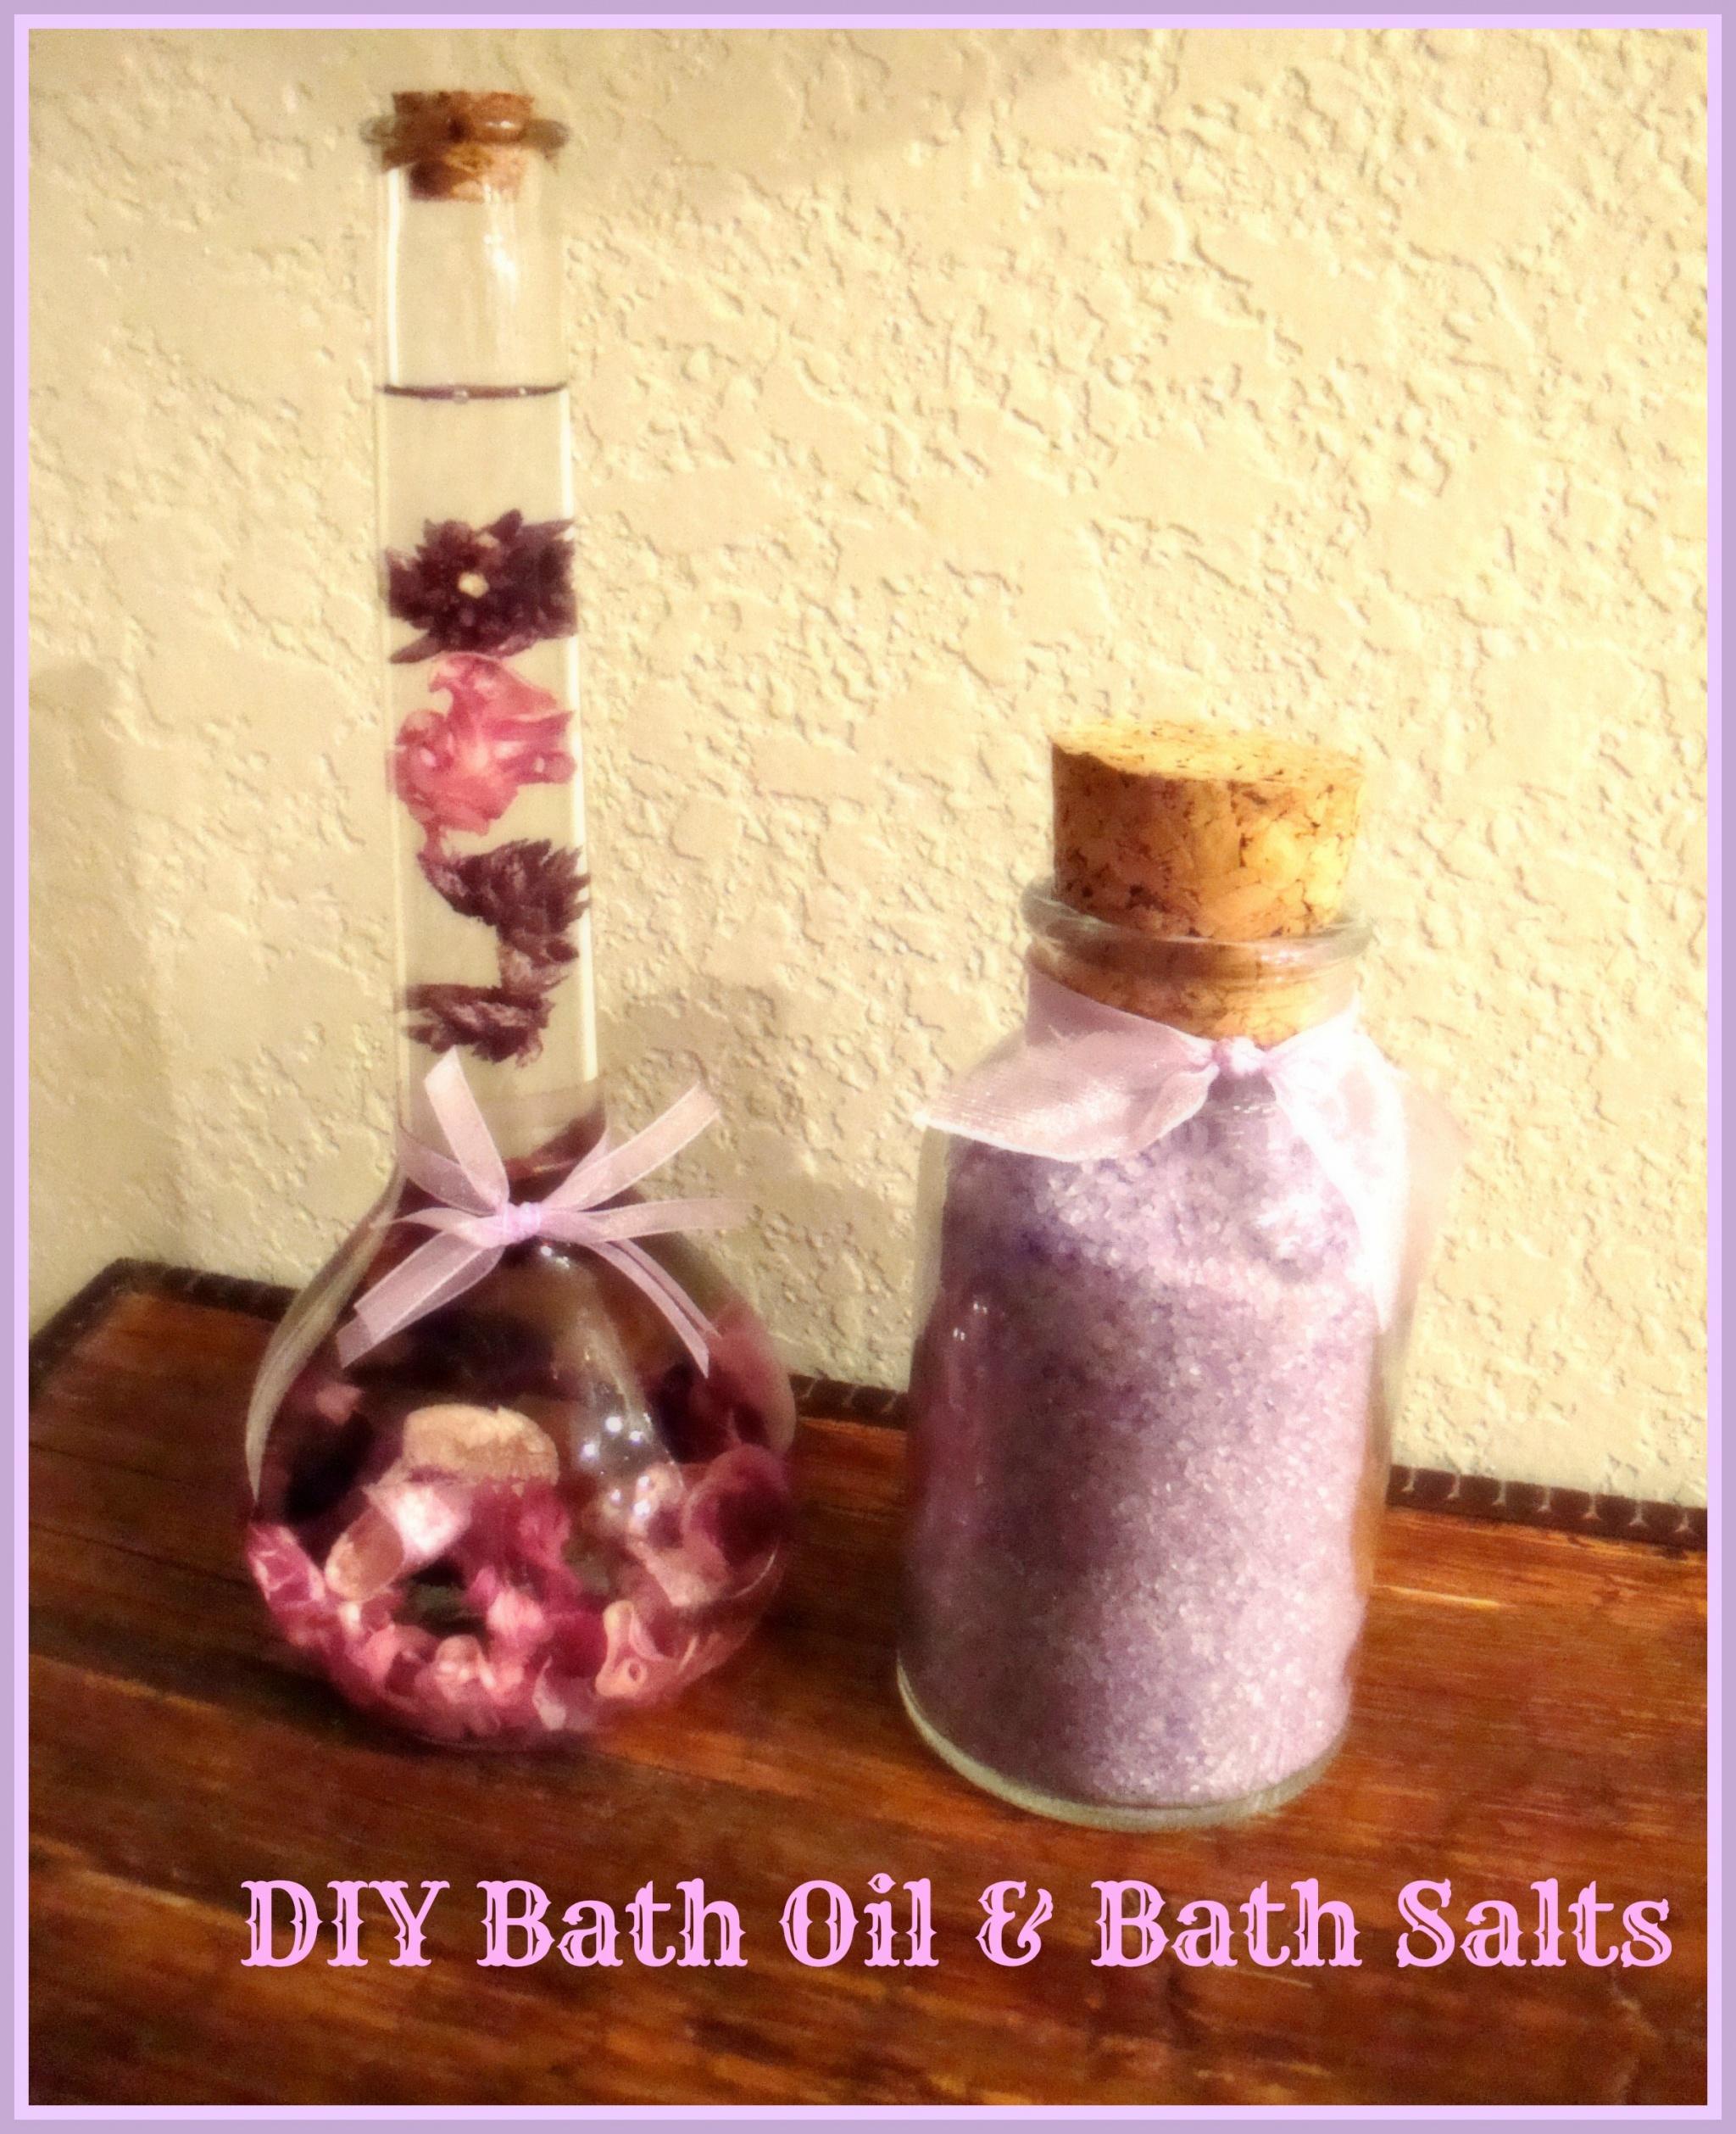 Bath oil and bath salts